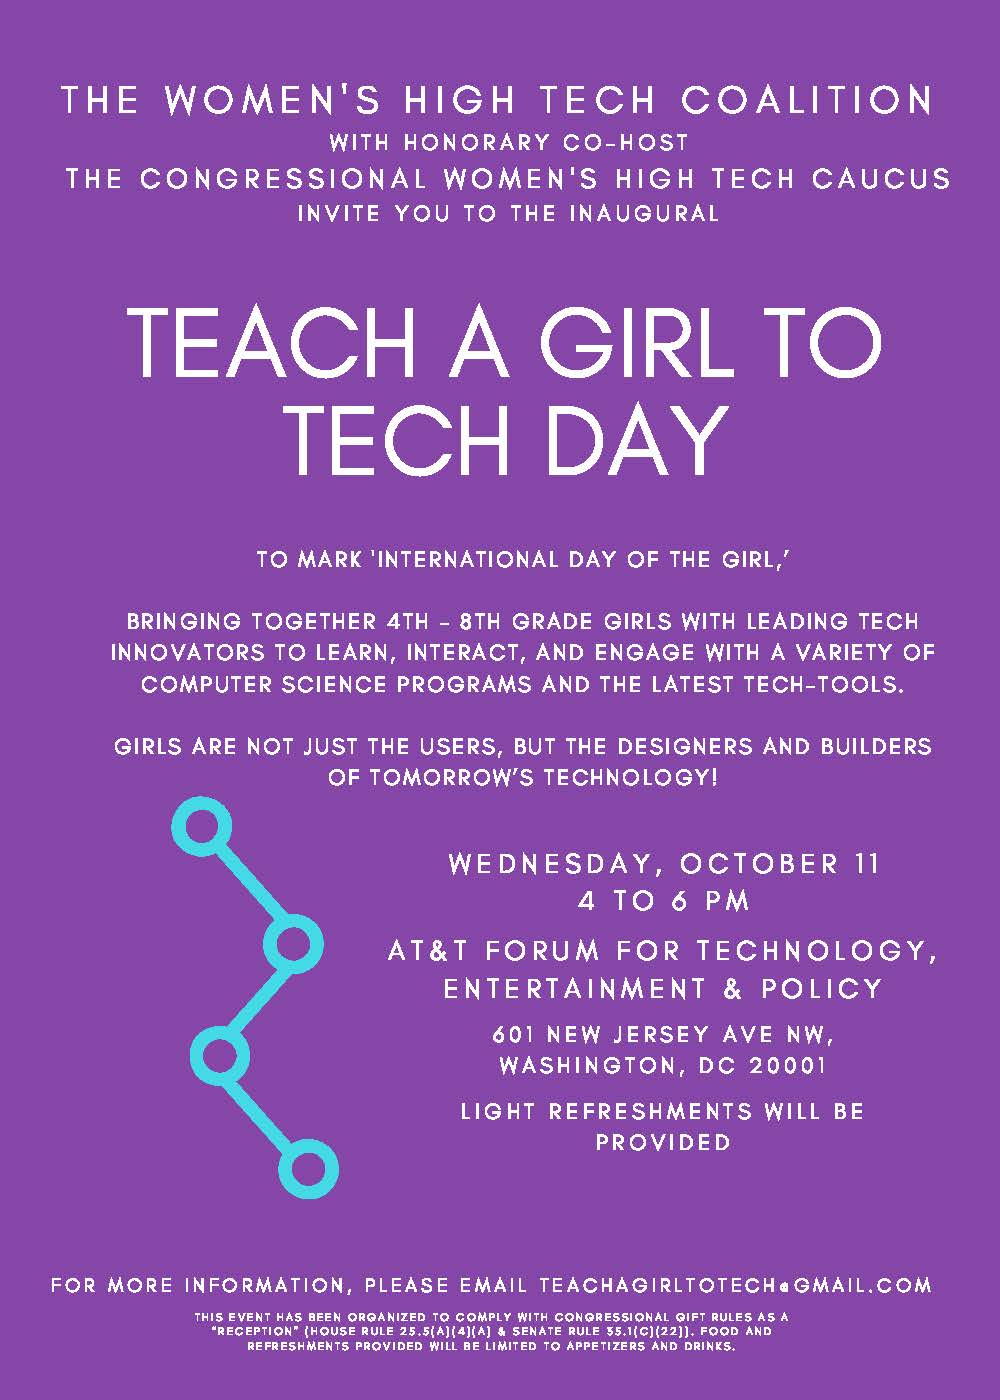 Teach a Girl to Tech Day